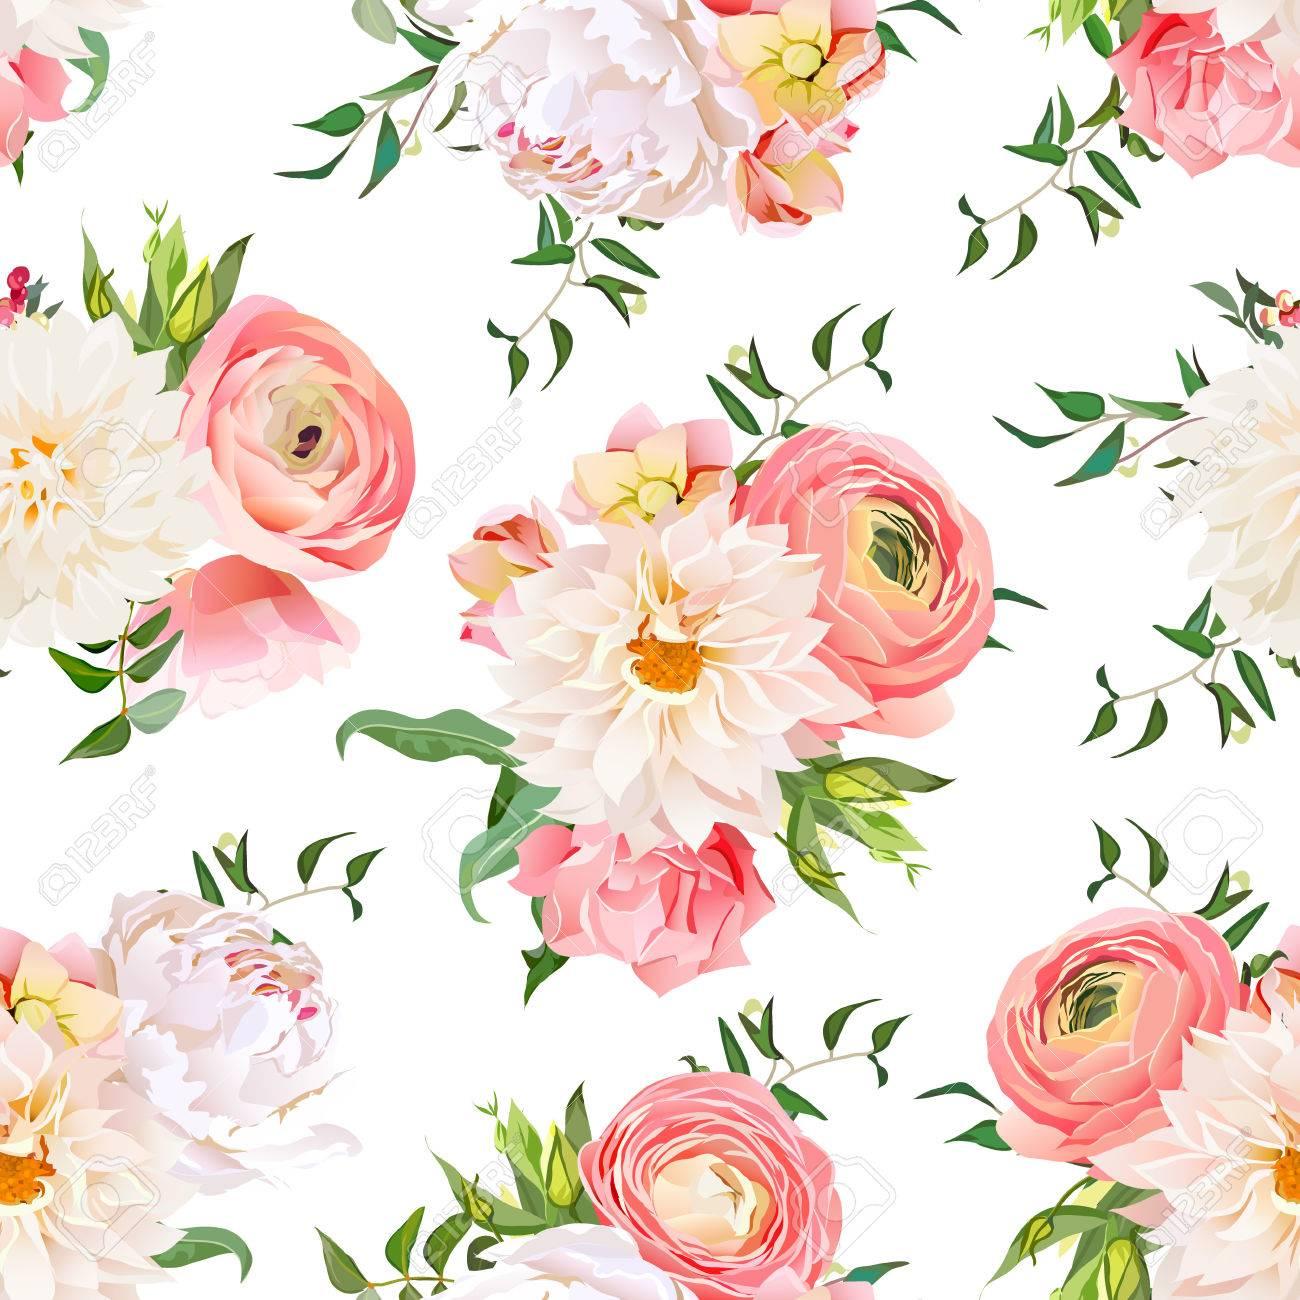 dahlia ranunculus rose and peony seamless pattern romantic garden print stock vector - Garden Rose And Peony